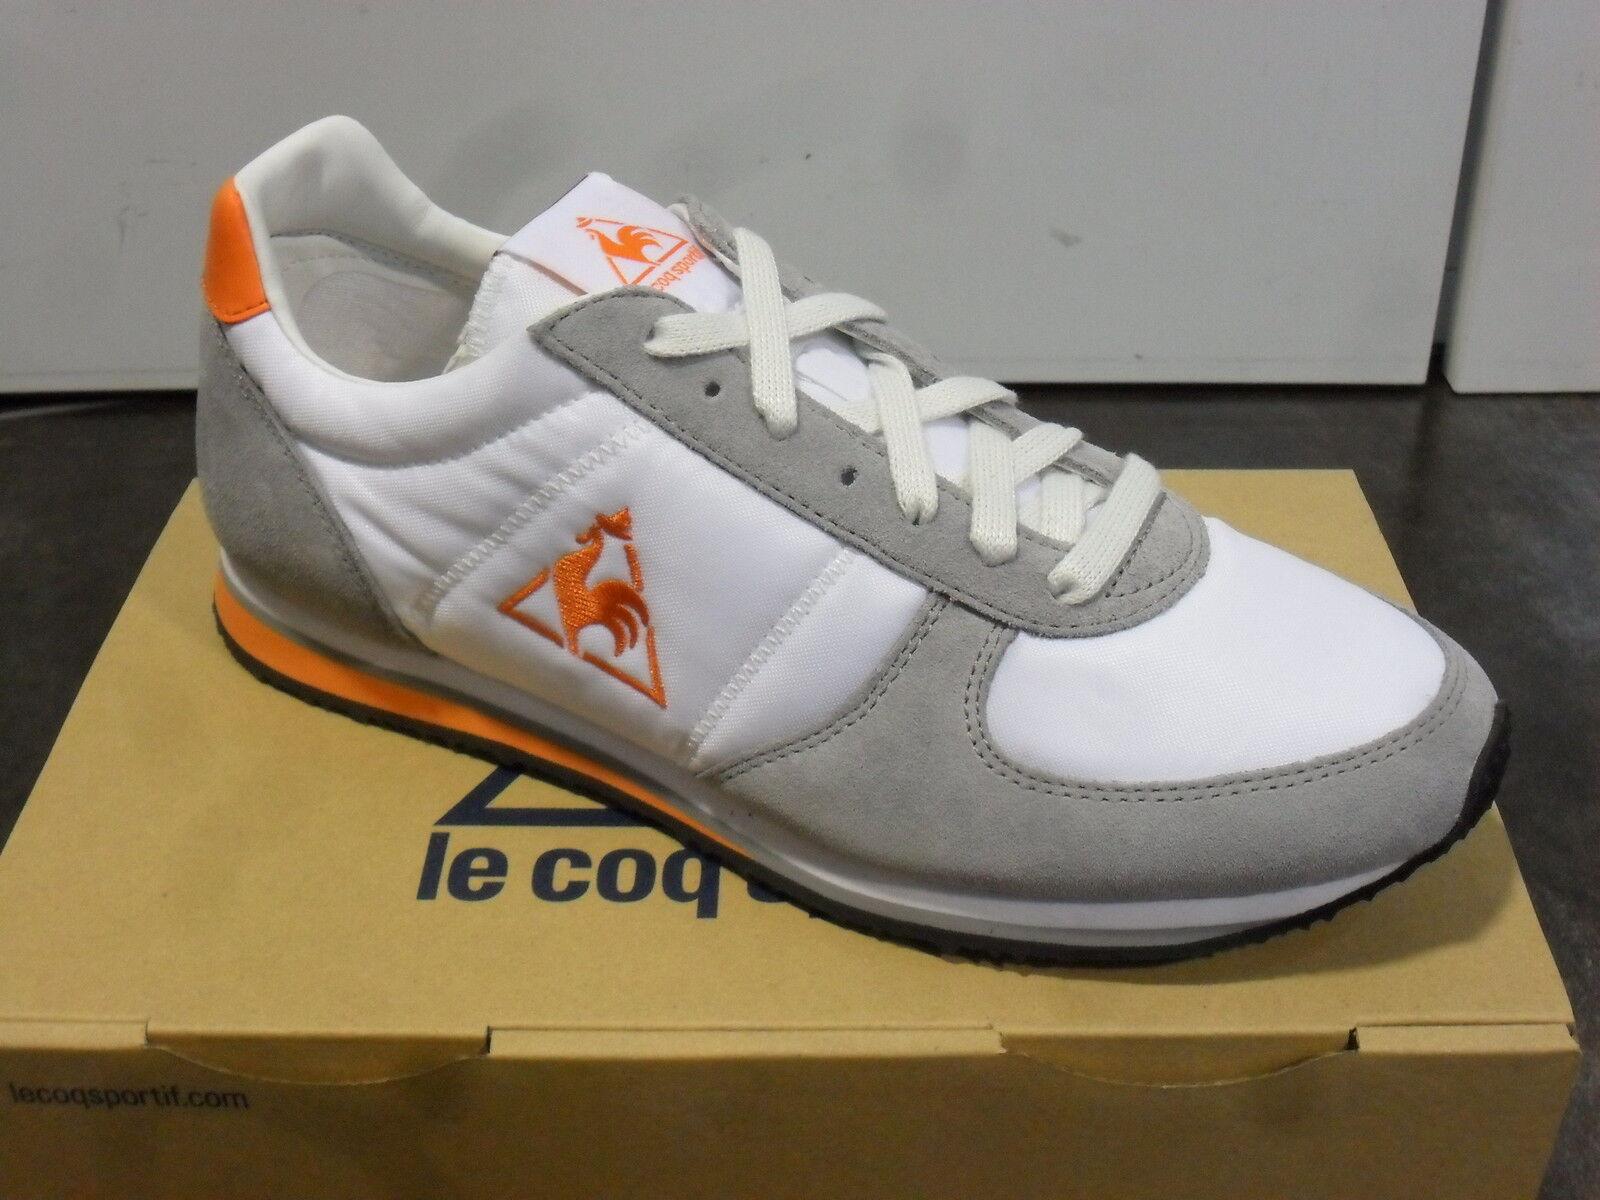 Zapatos casuales salvajes FW14 NR. 40 LE COQ SPORTIF SCARPE TELA UOMO DONNA BOLIVAR BIANCA 1411321